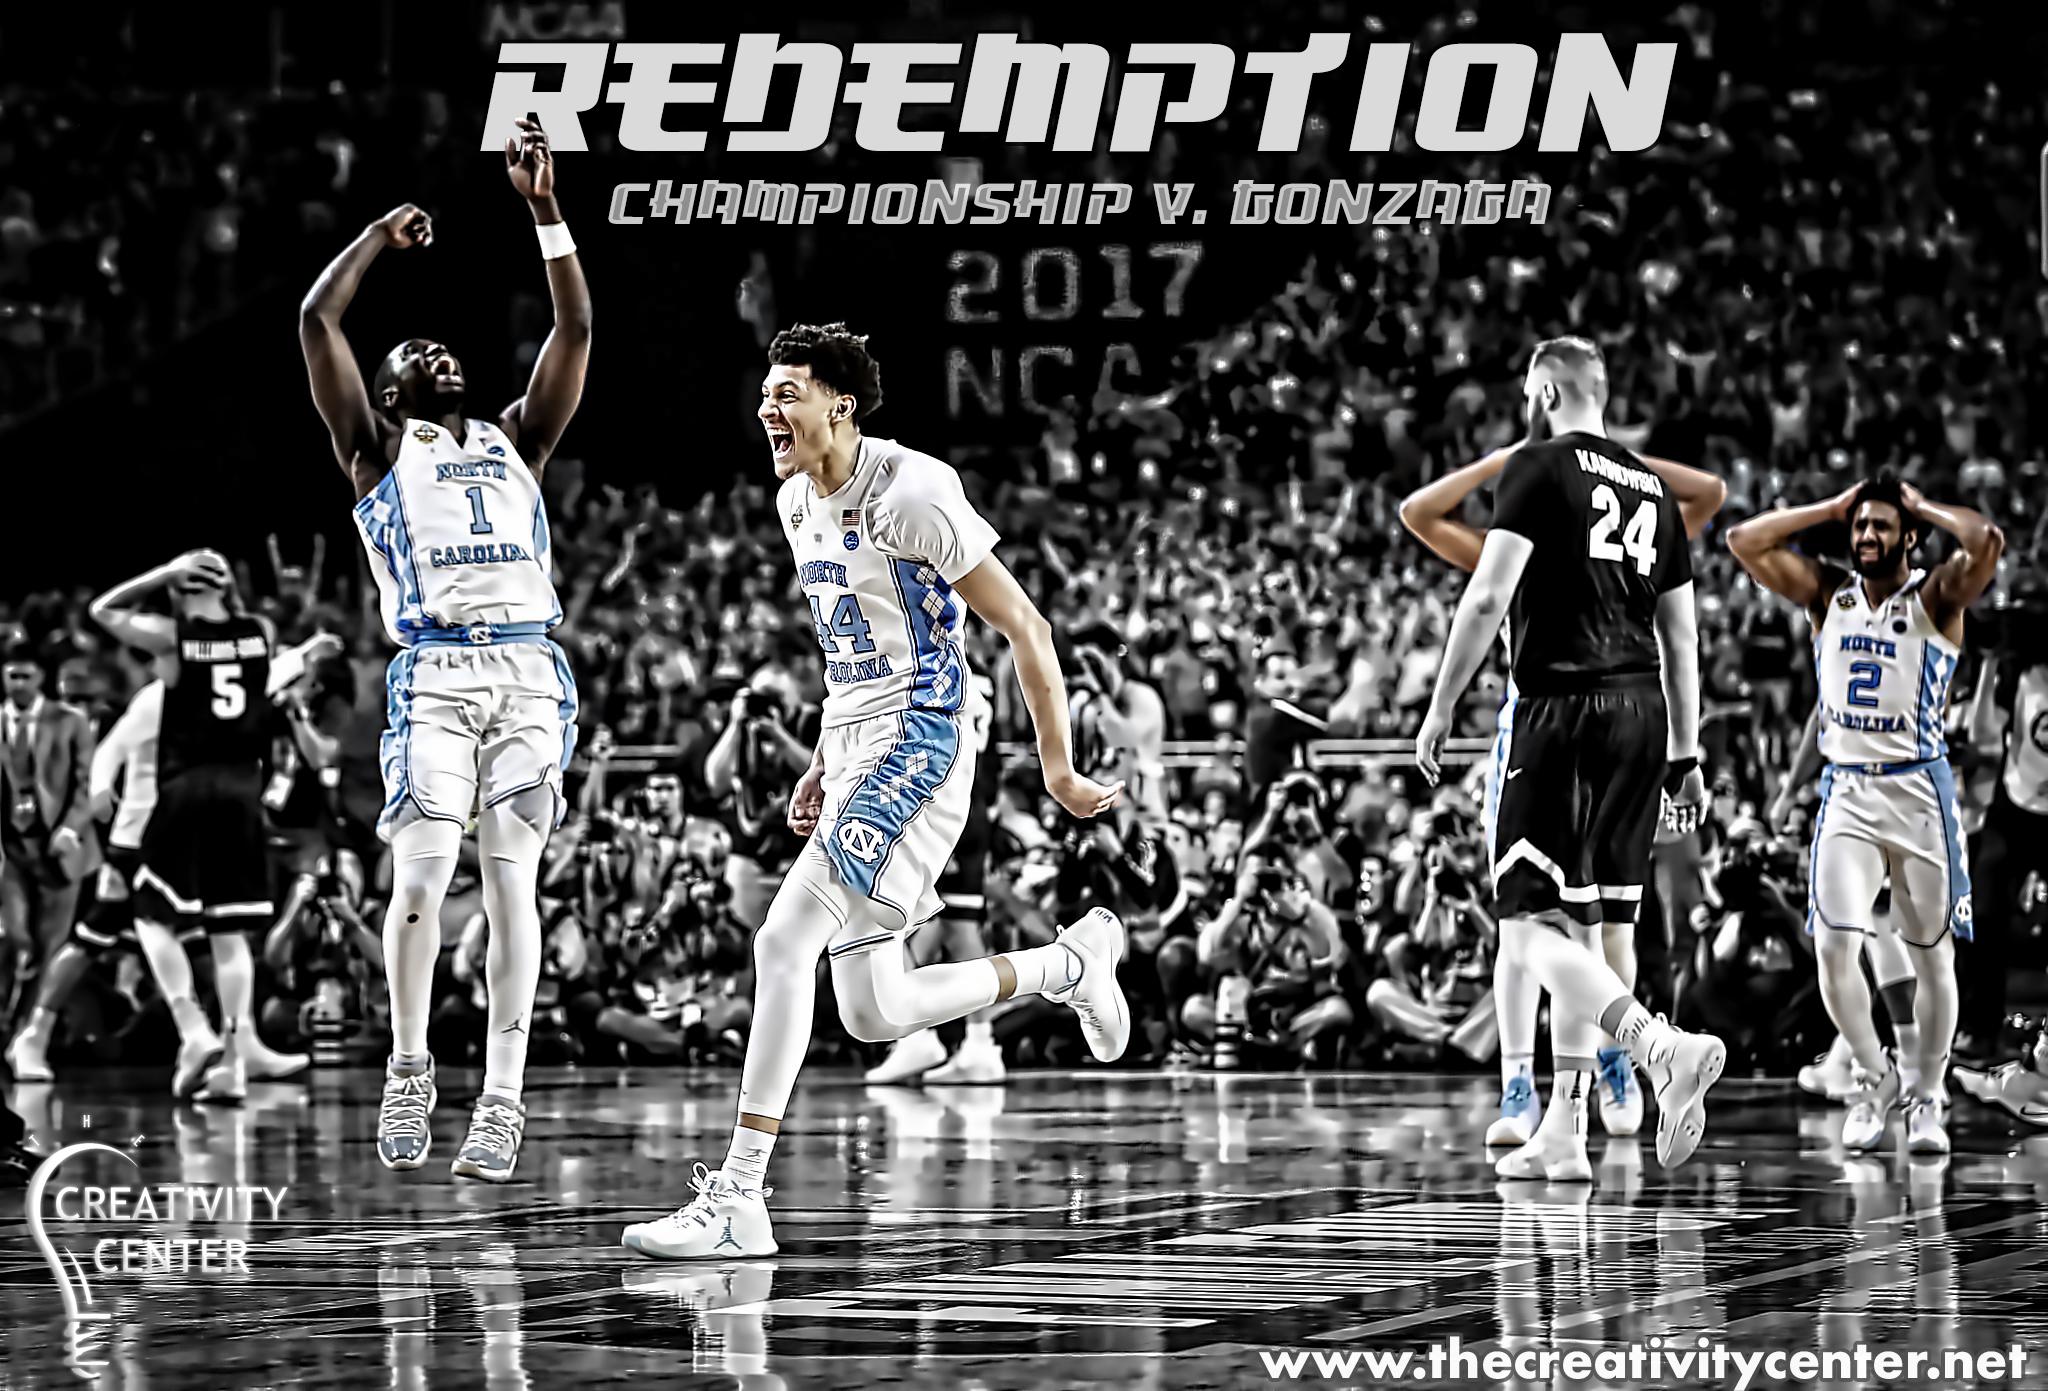 champs redemption.jpg